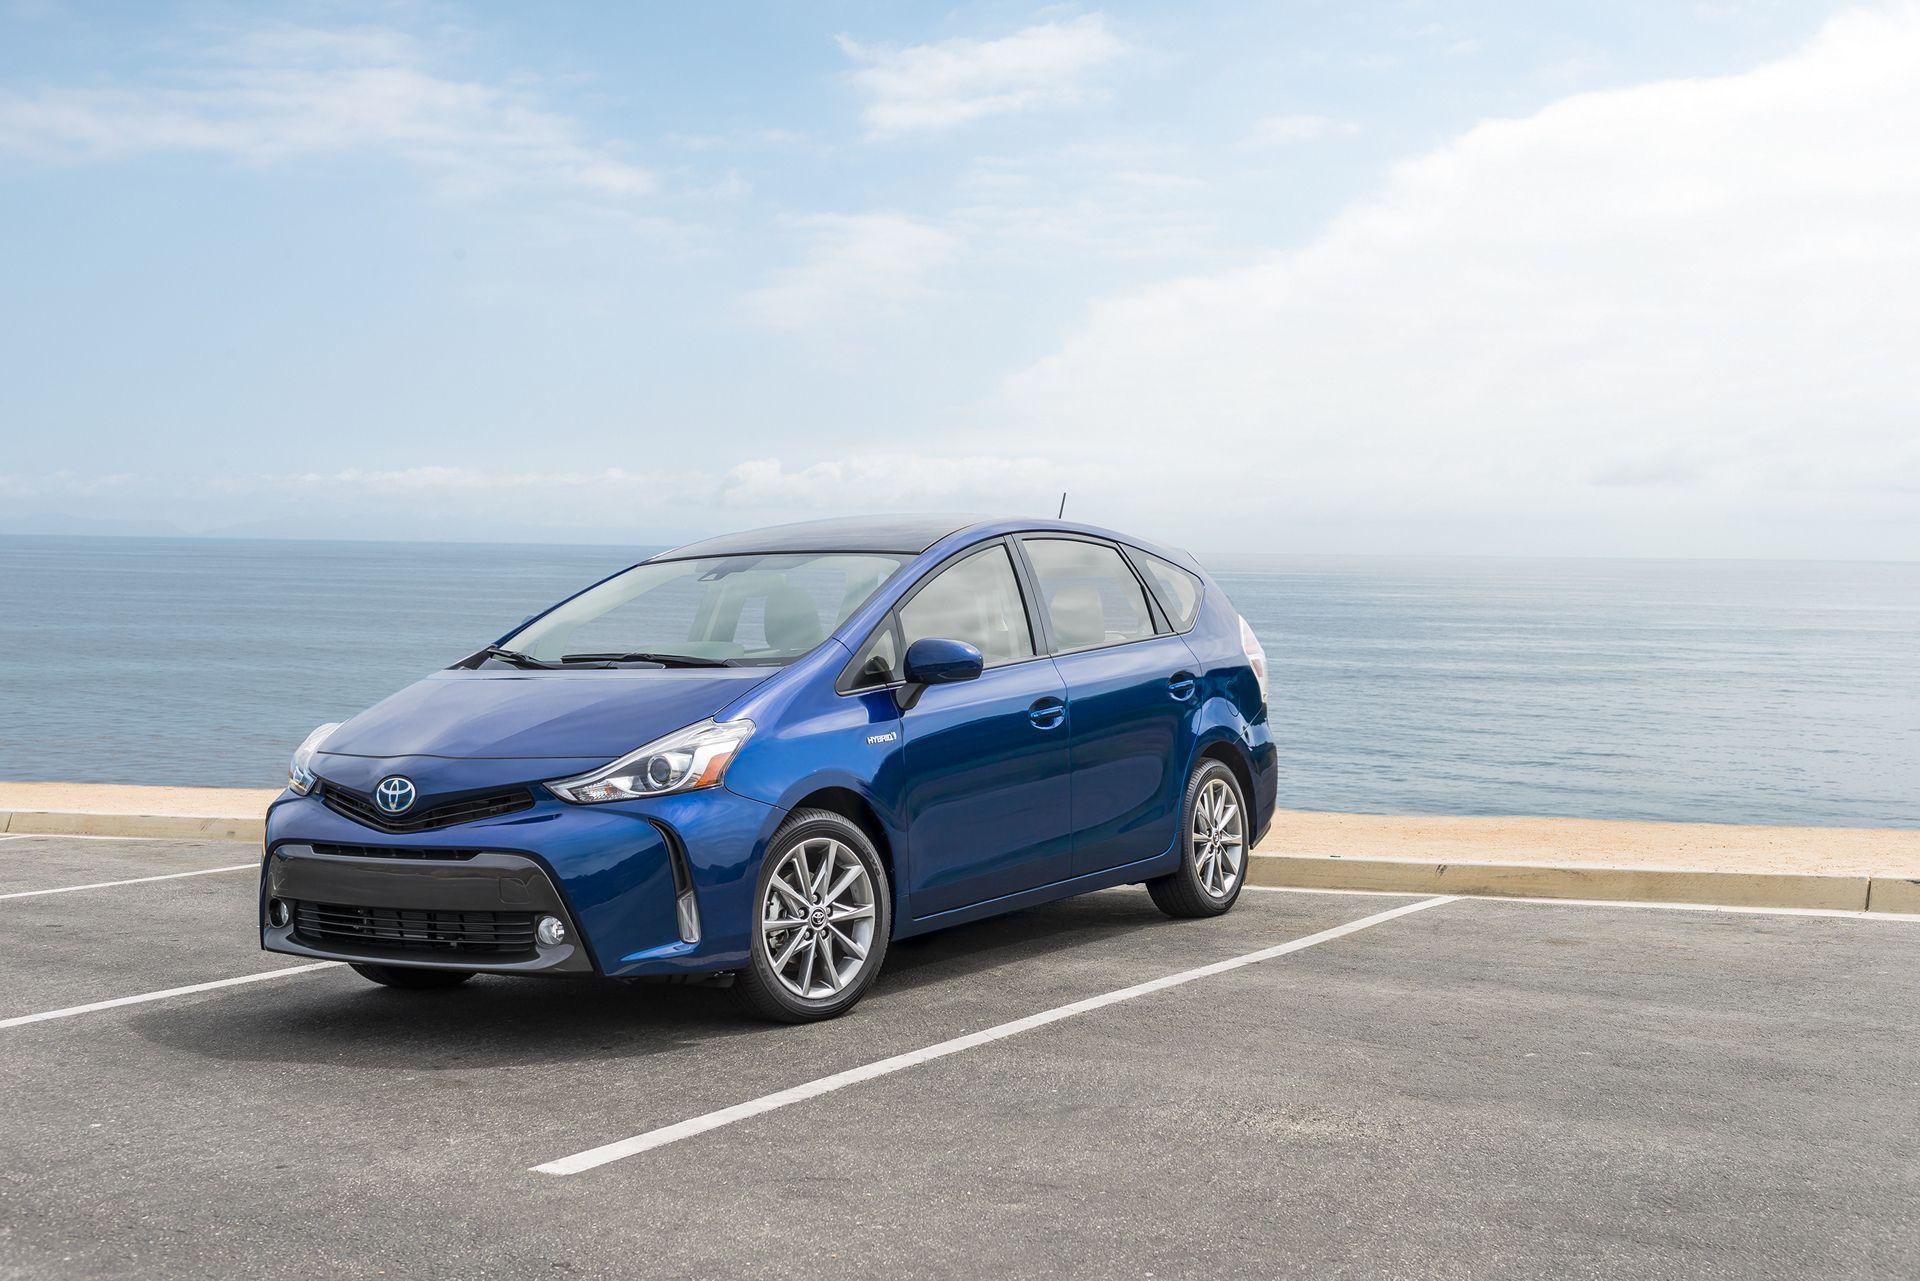 2016 Toyota Prius V Review Carrrs Auto Portal Toyota Prius Toyota Toyota Cars